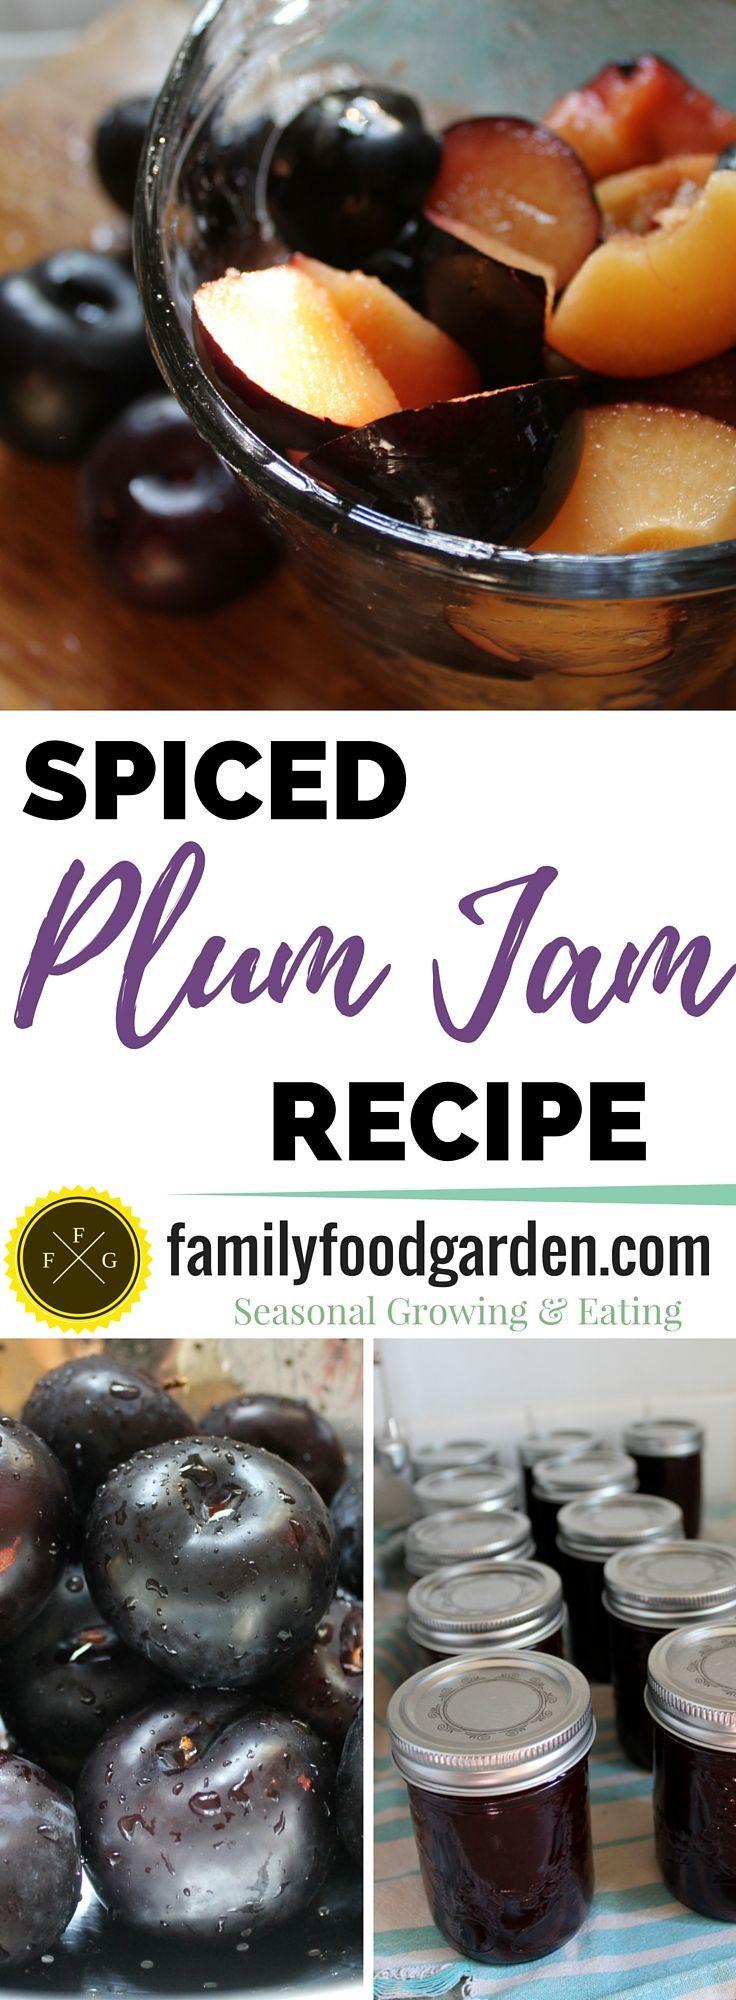 Home canning recipe: Spiced Plum Jam